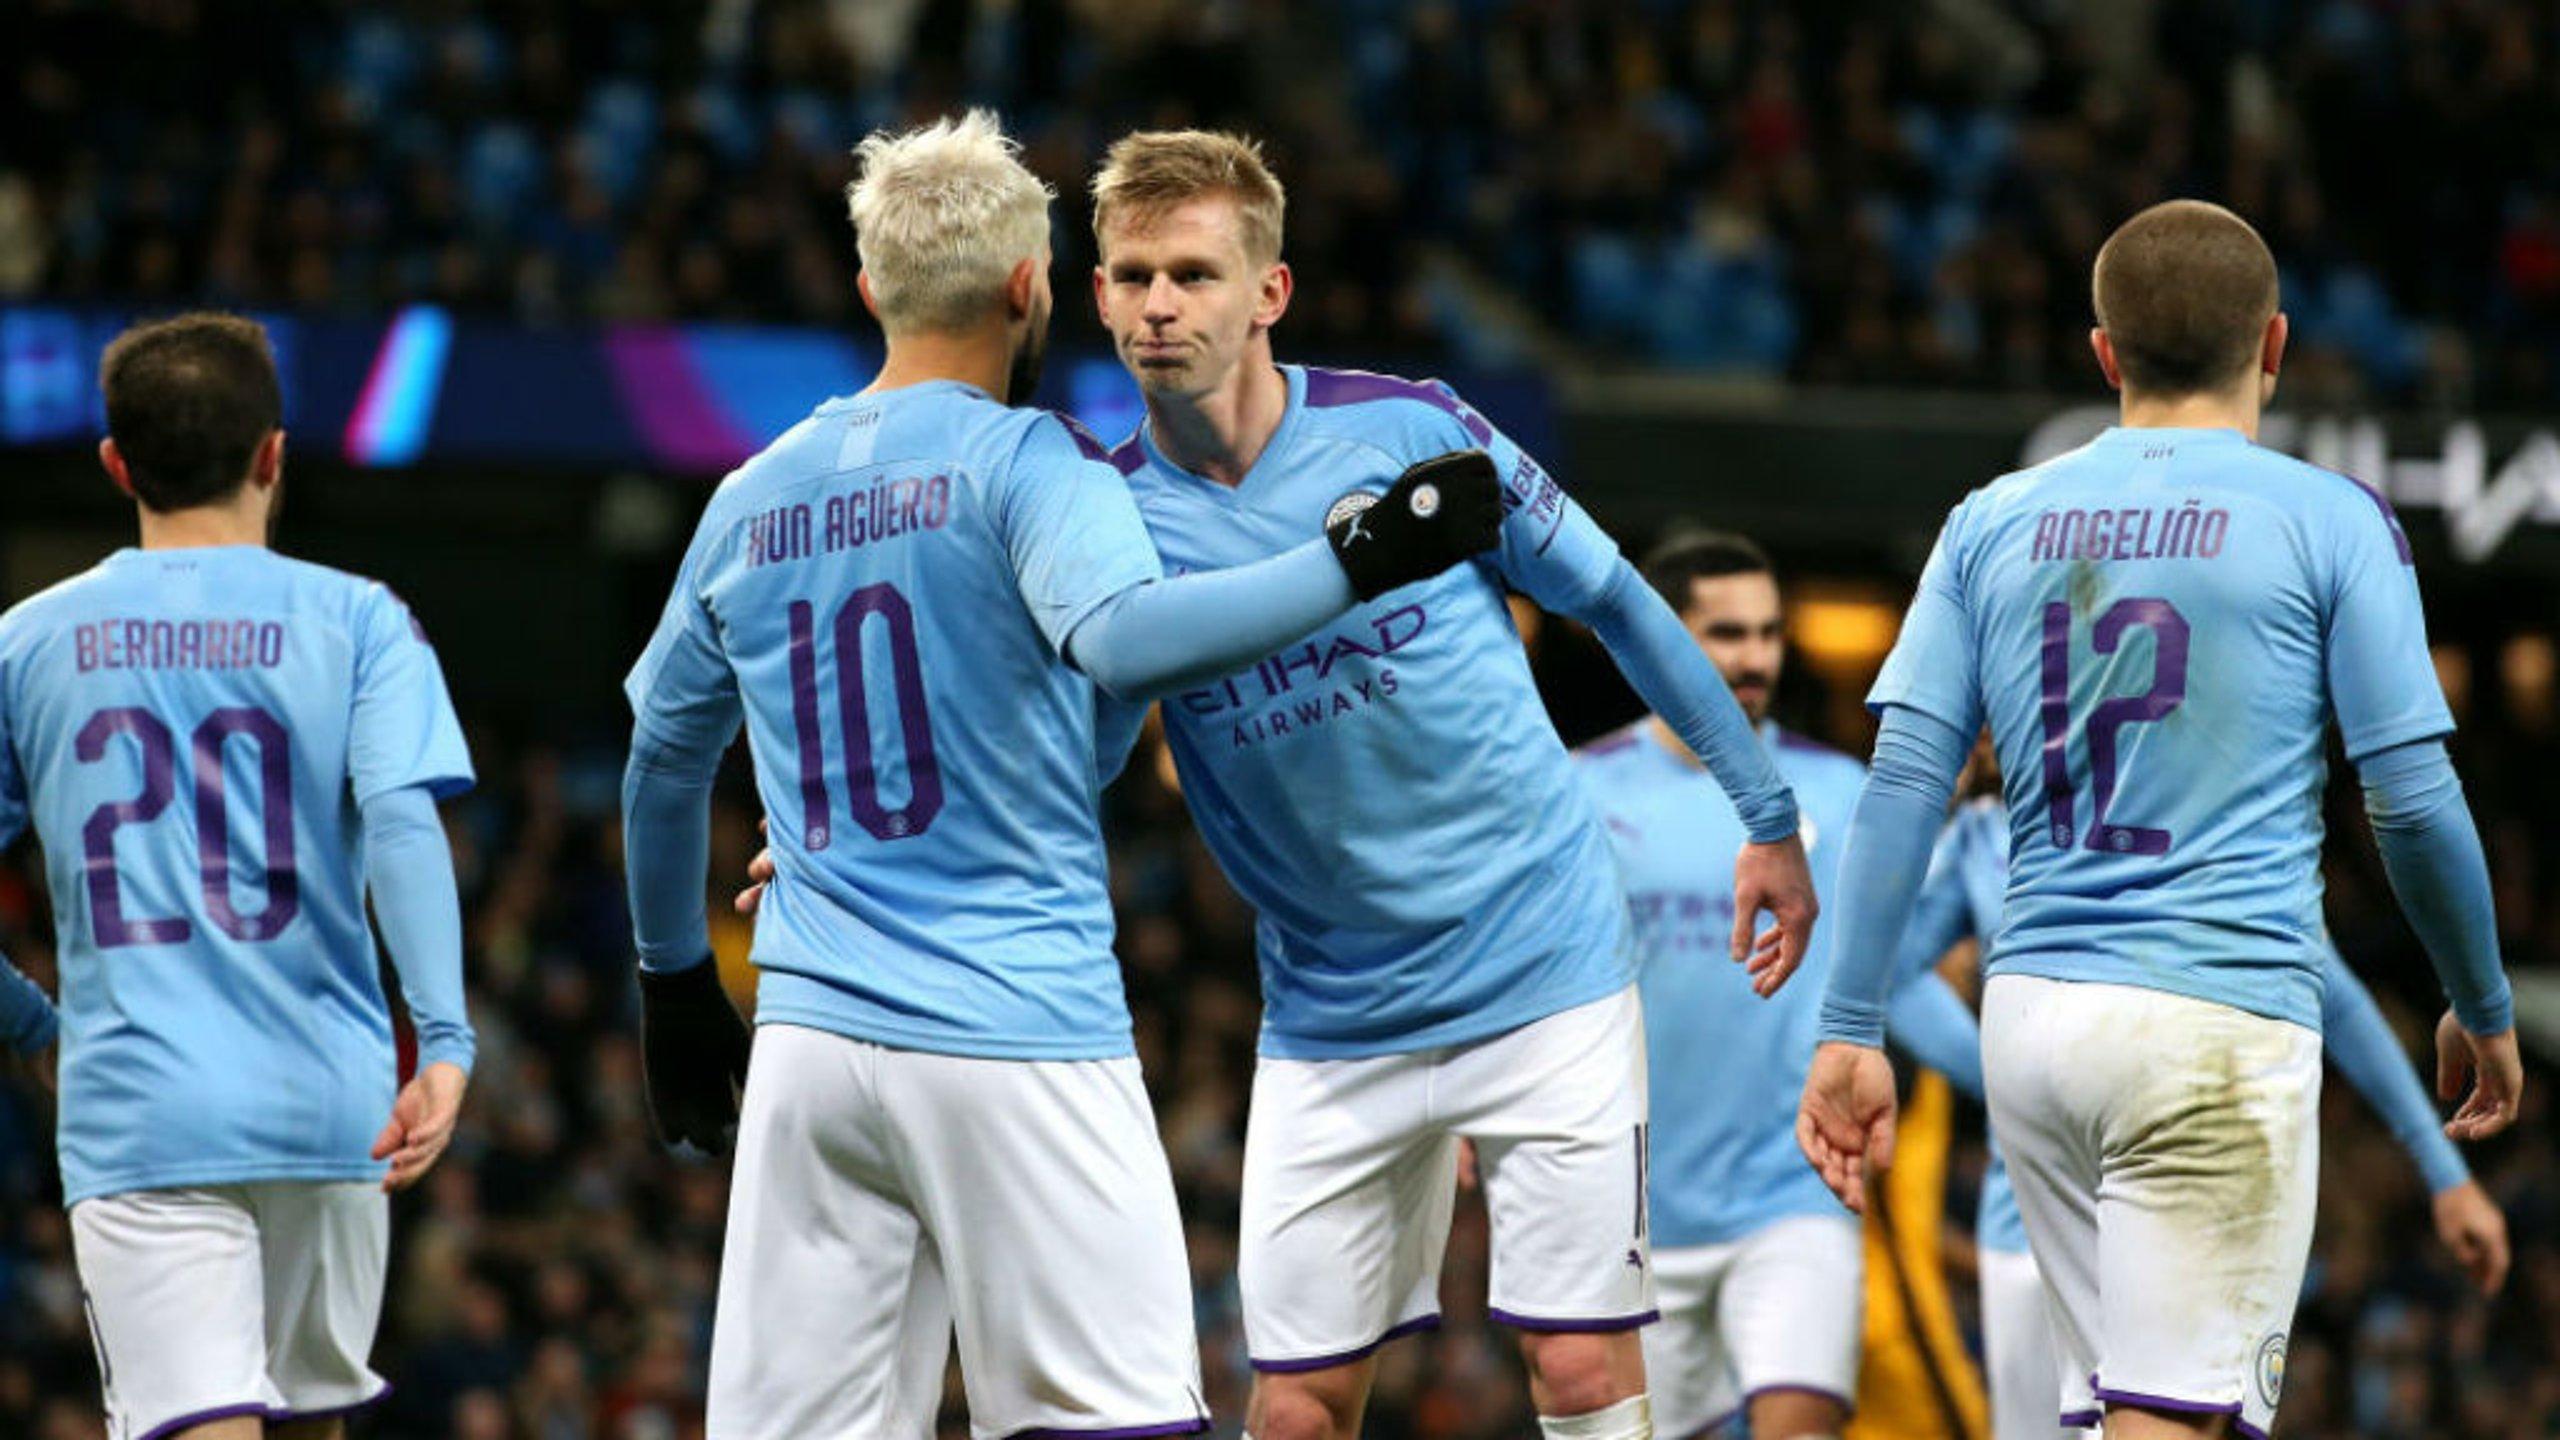 TWO'S COMPANY: Zinchenko salutes fellow goal scorer Aguero